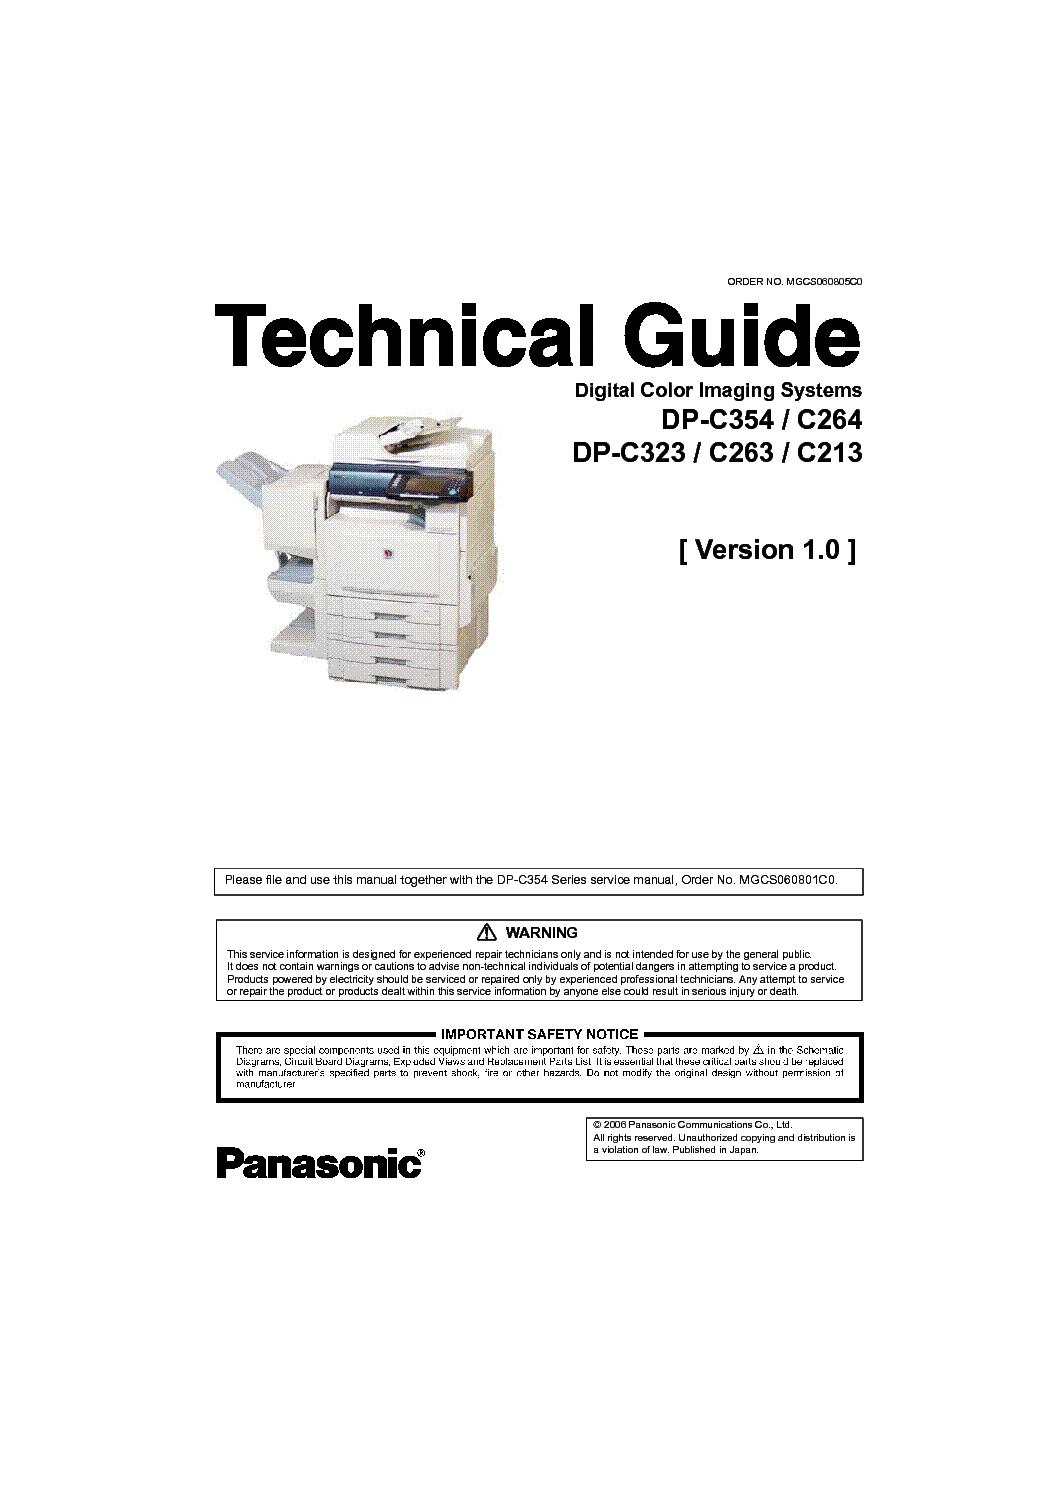 DOWNLOAD DRIVERS: PANASONIC WORKIO DP-C264